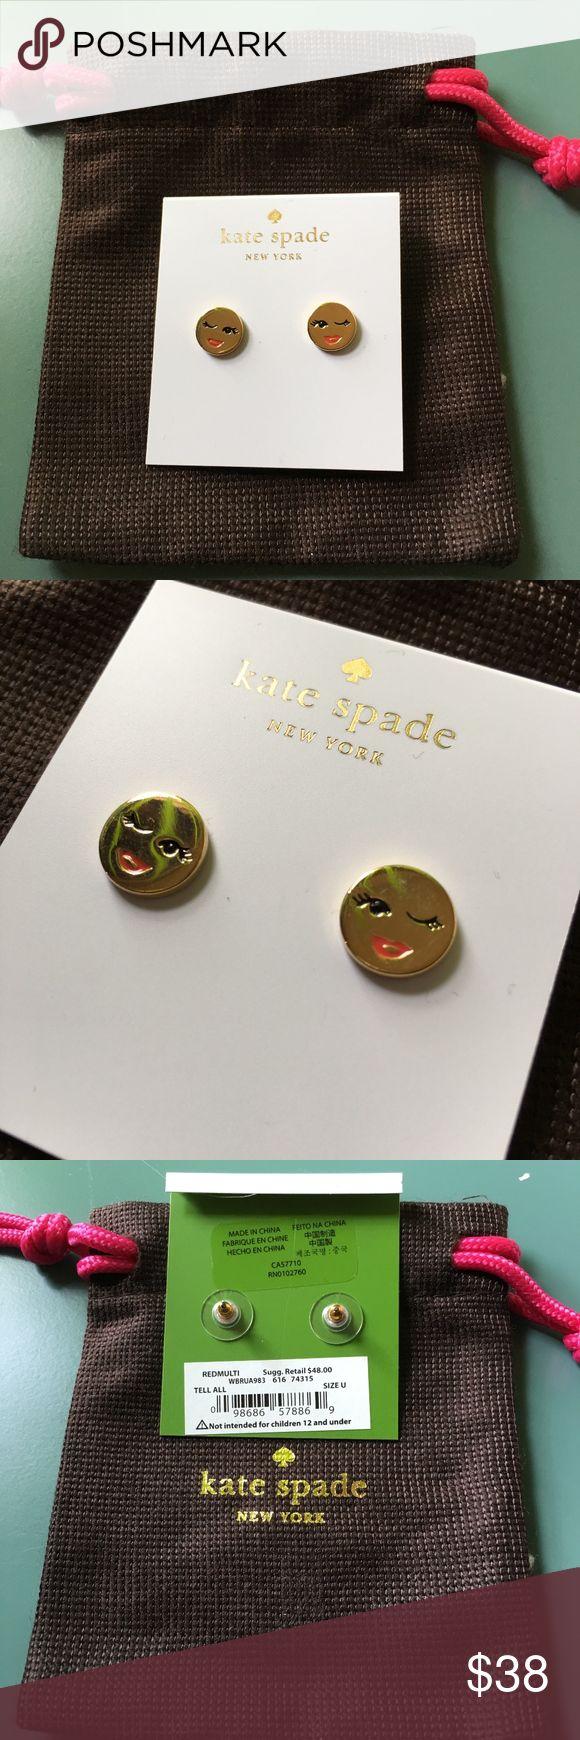 Kate Spade Tell All Emoji Earrings KSNY 12k gold tone wink emoji earrings. Dust bag included. kate spade Jewelry Earrings